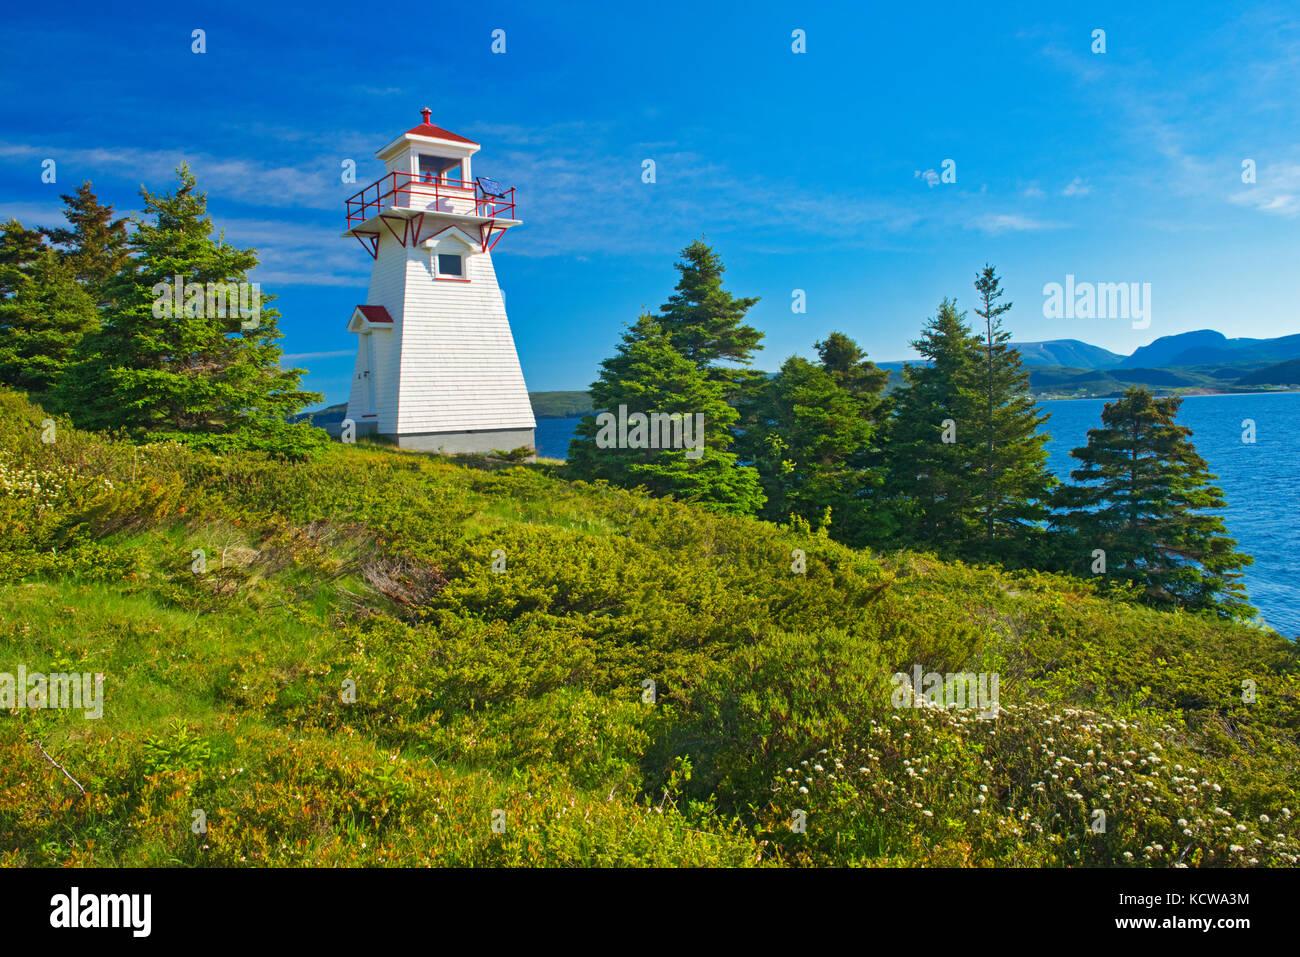 Woody Point Lighthouse, Gros Morne National Park, Newfoundland & Labrador, Canada - Stock Image